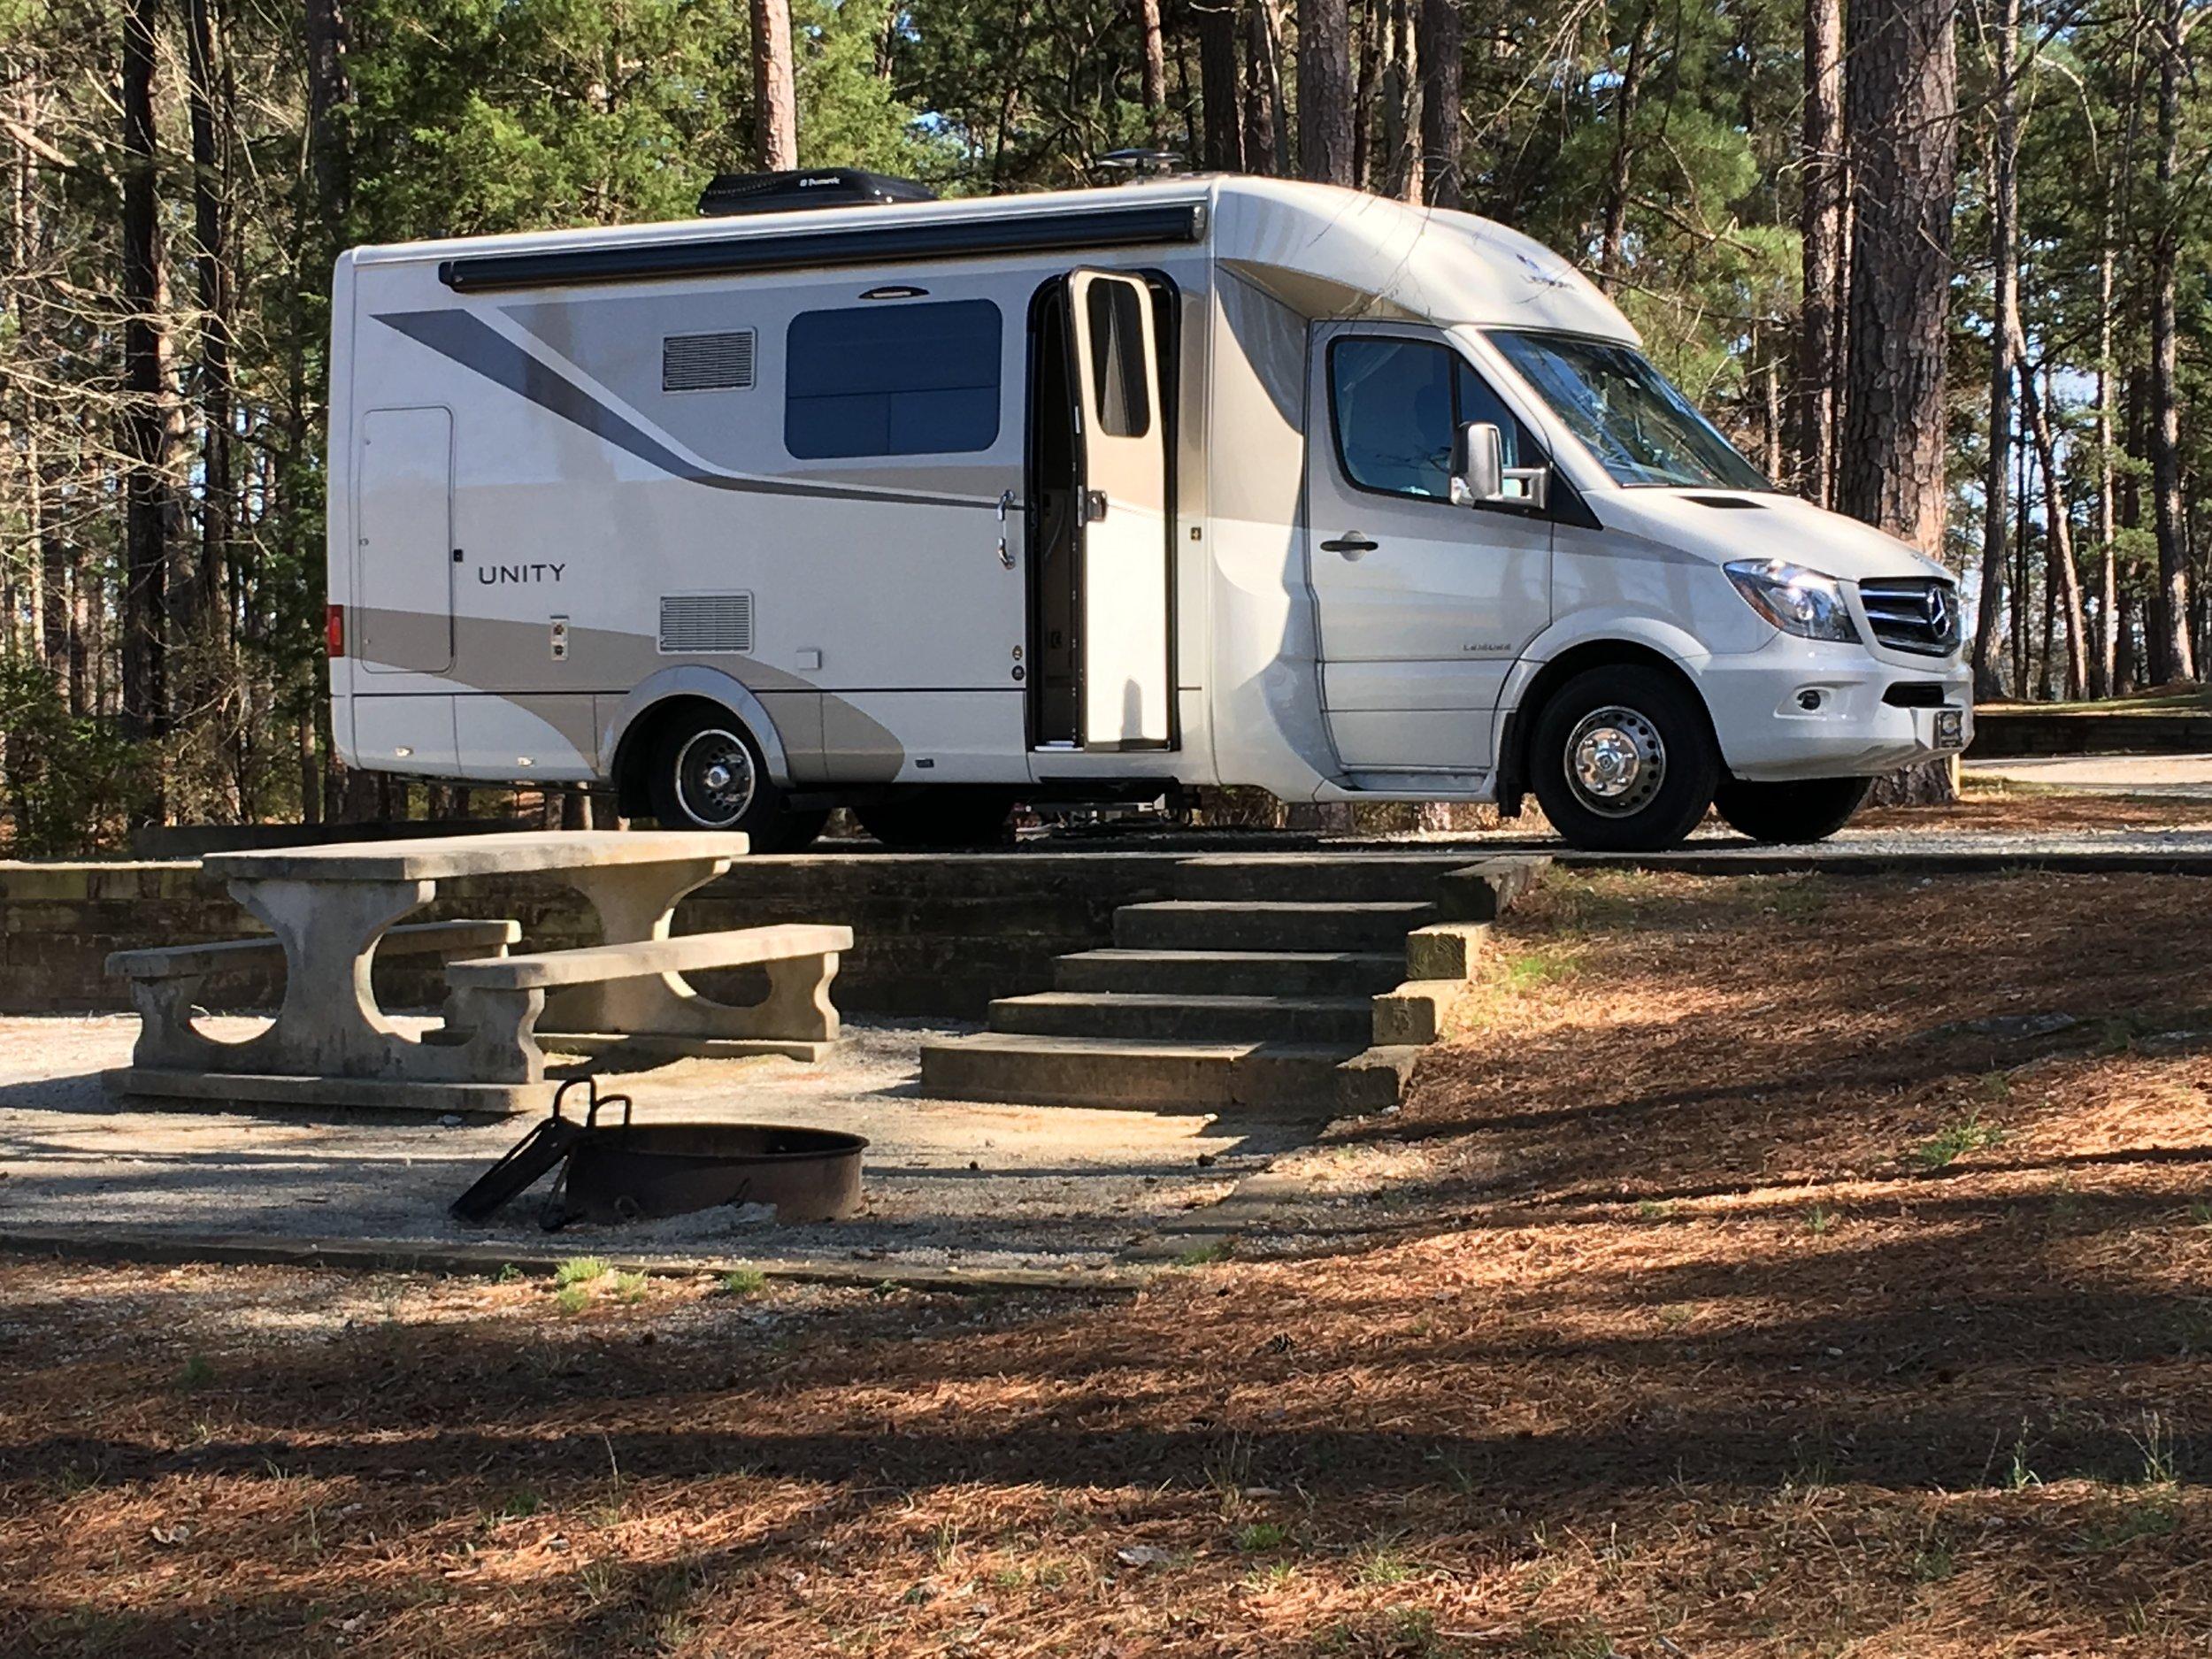 Lakefront campsite at Mistletoe State Park, Appling, Georgia